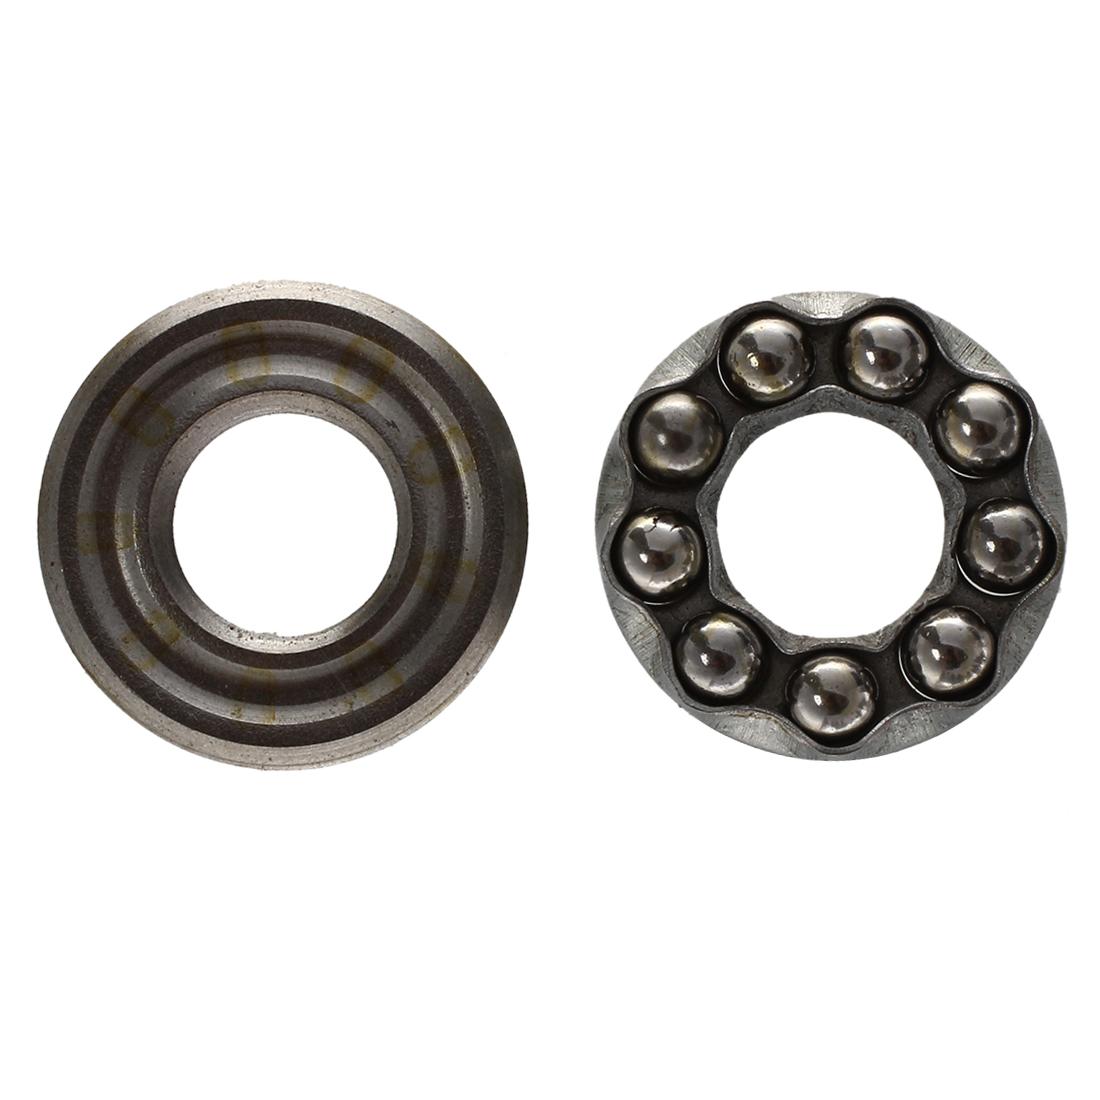 2 Pcs 10 x 24 x 9mm 51100 Single Direction Thrust Ball Bearings N3